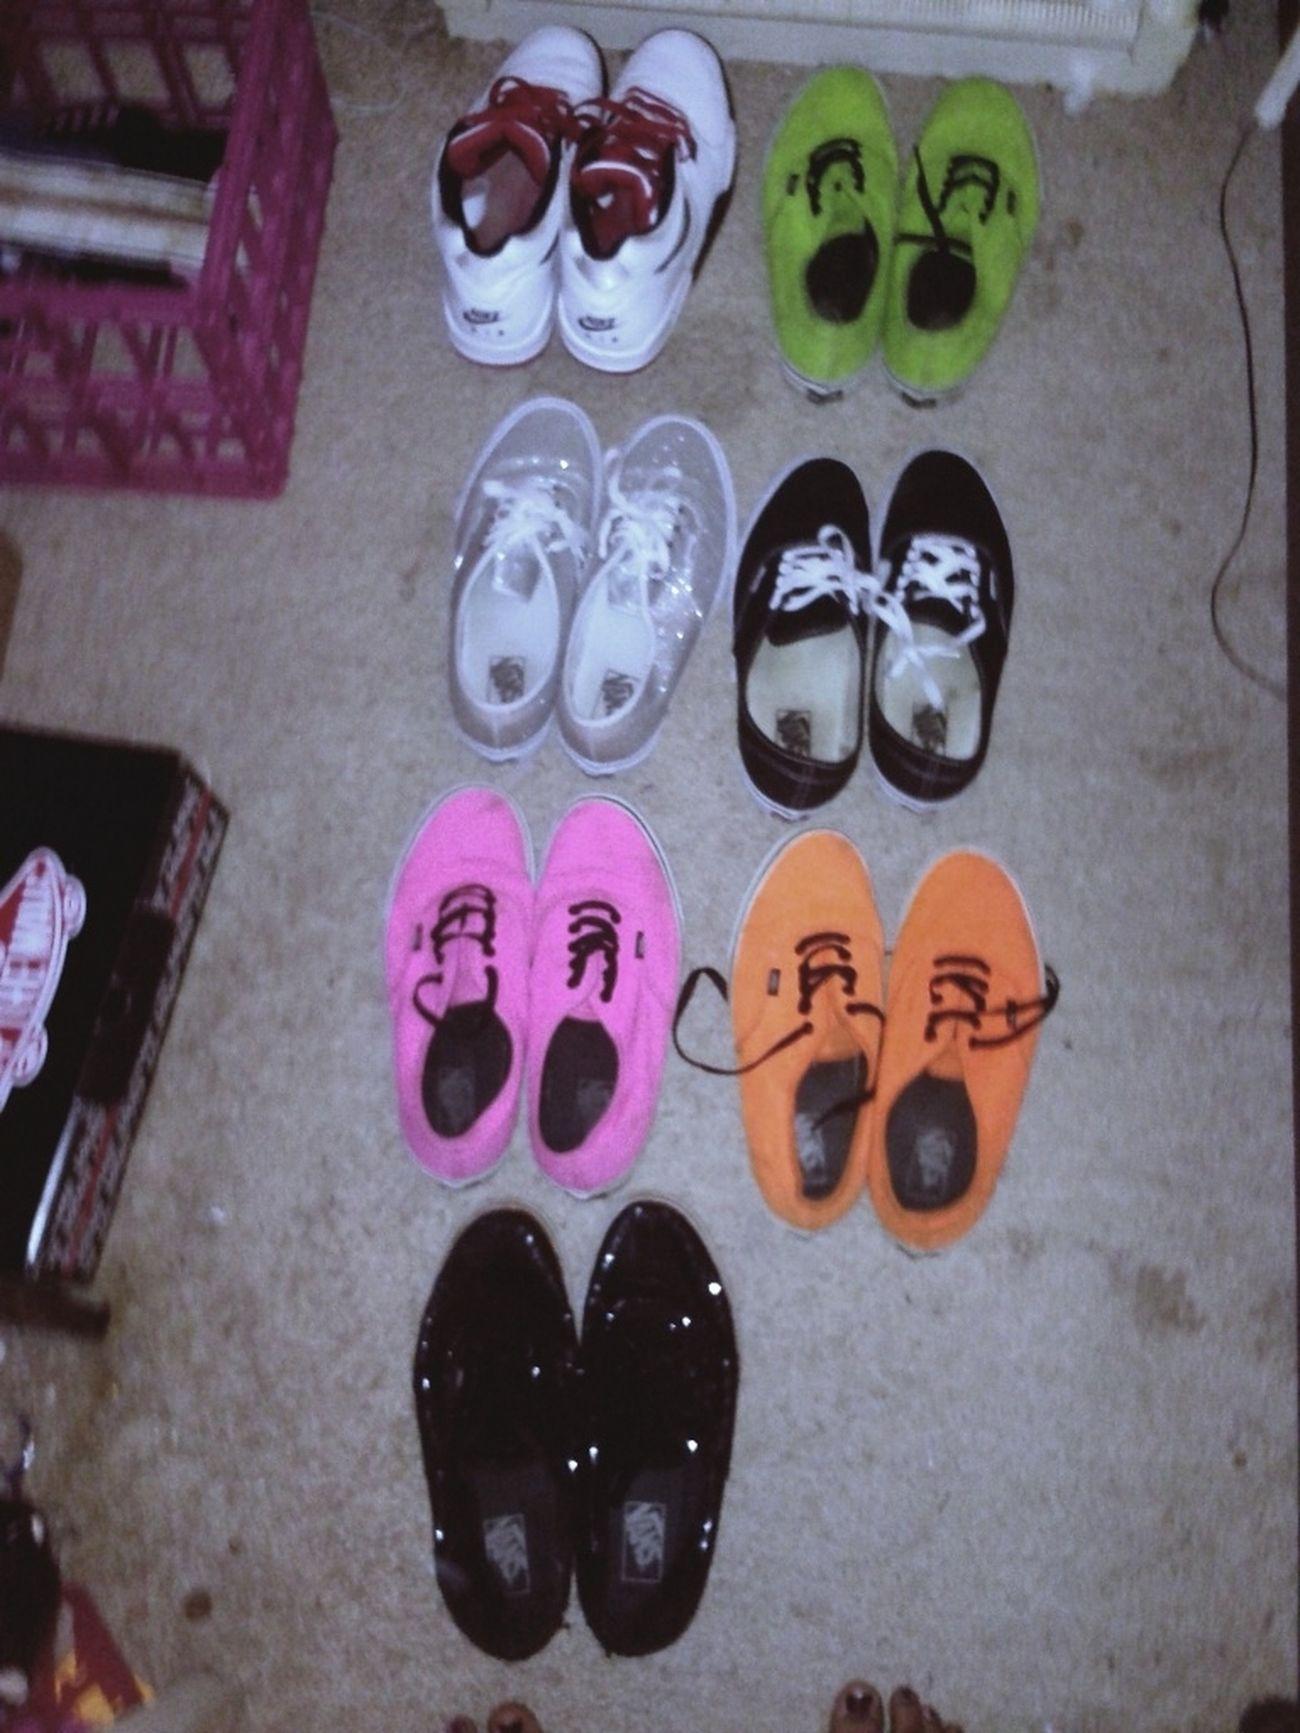 My Shoessssss!